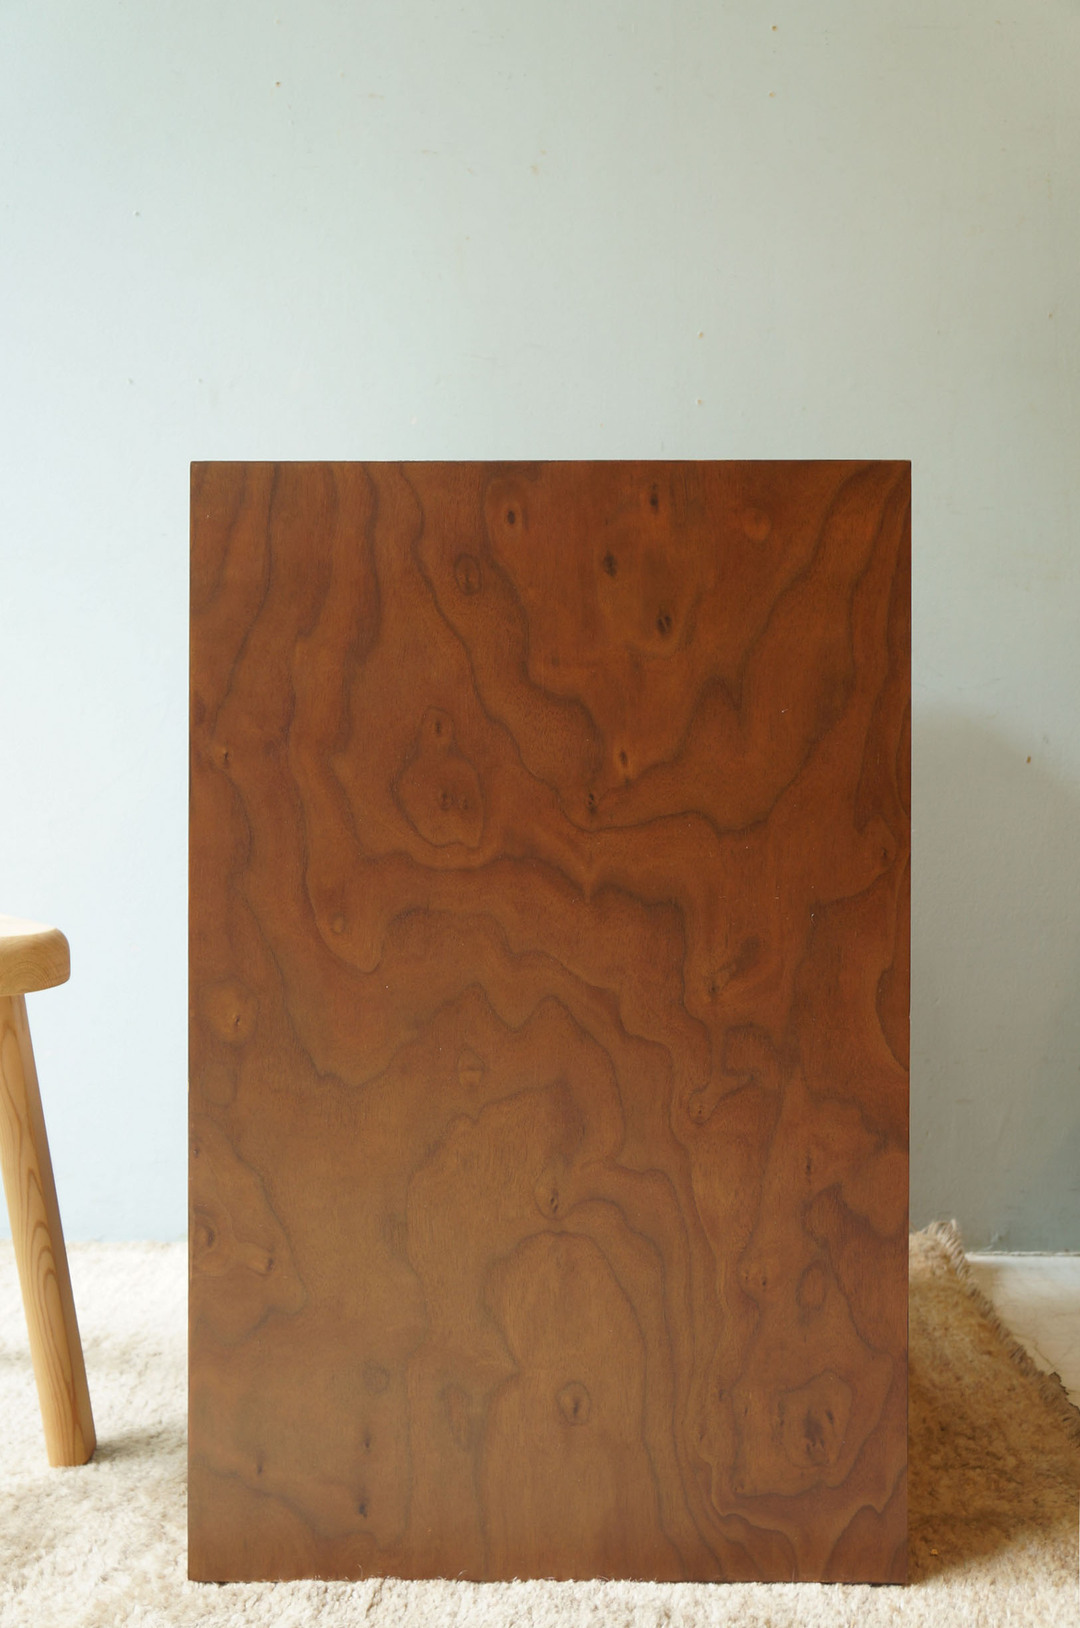 Wooden Audio Rack Simple Modern Design/オーディオラック 木製 シンプル モダン キャビネット 収納家具 1